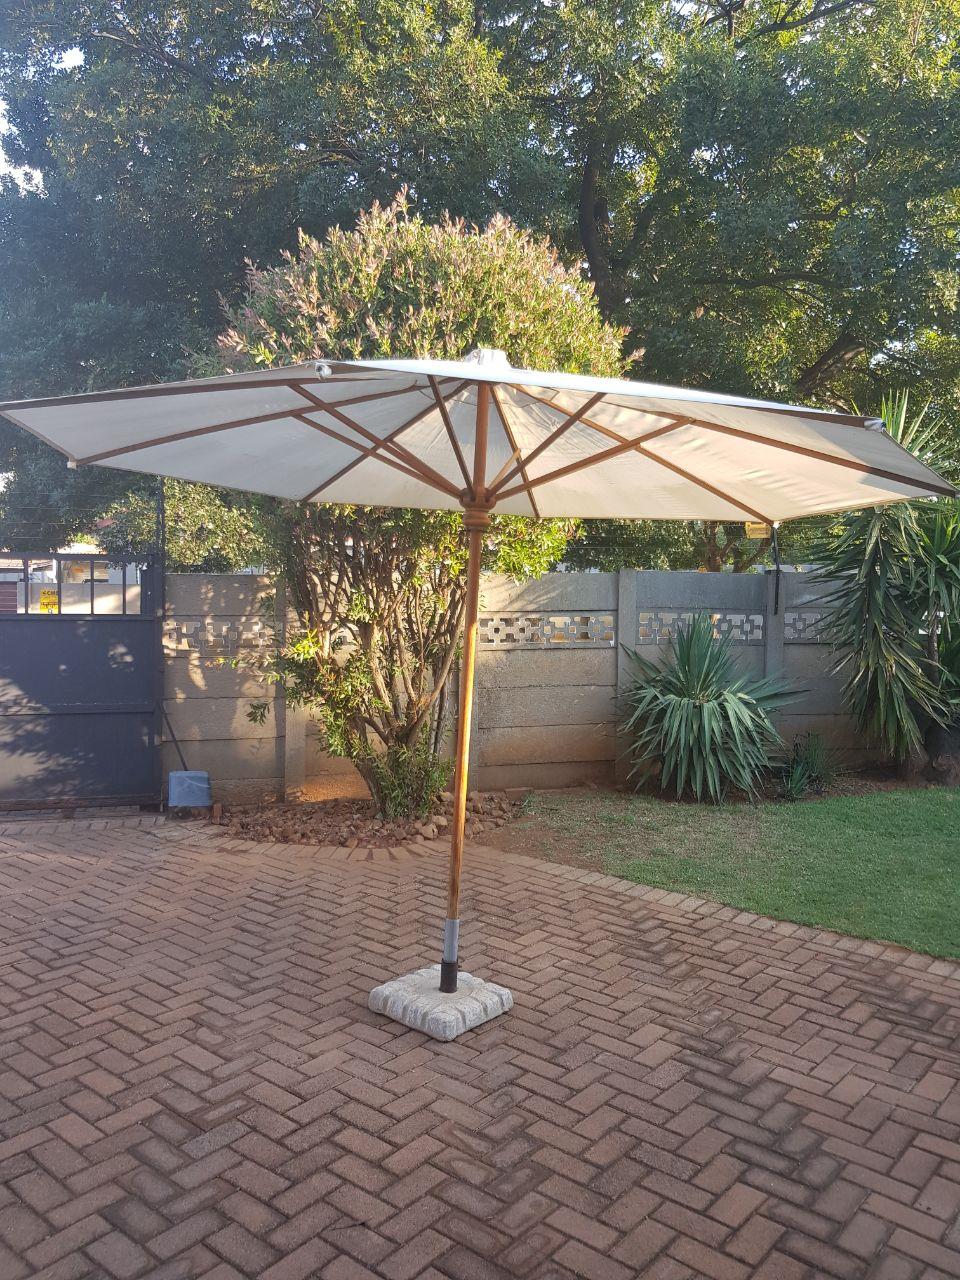 Cabana Shade Patio Umbrella